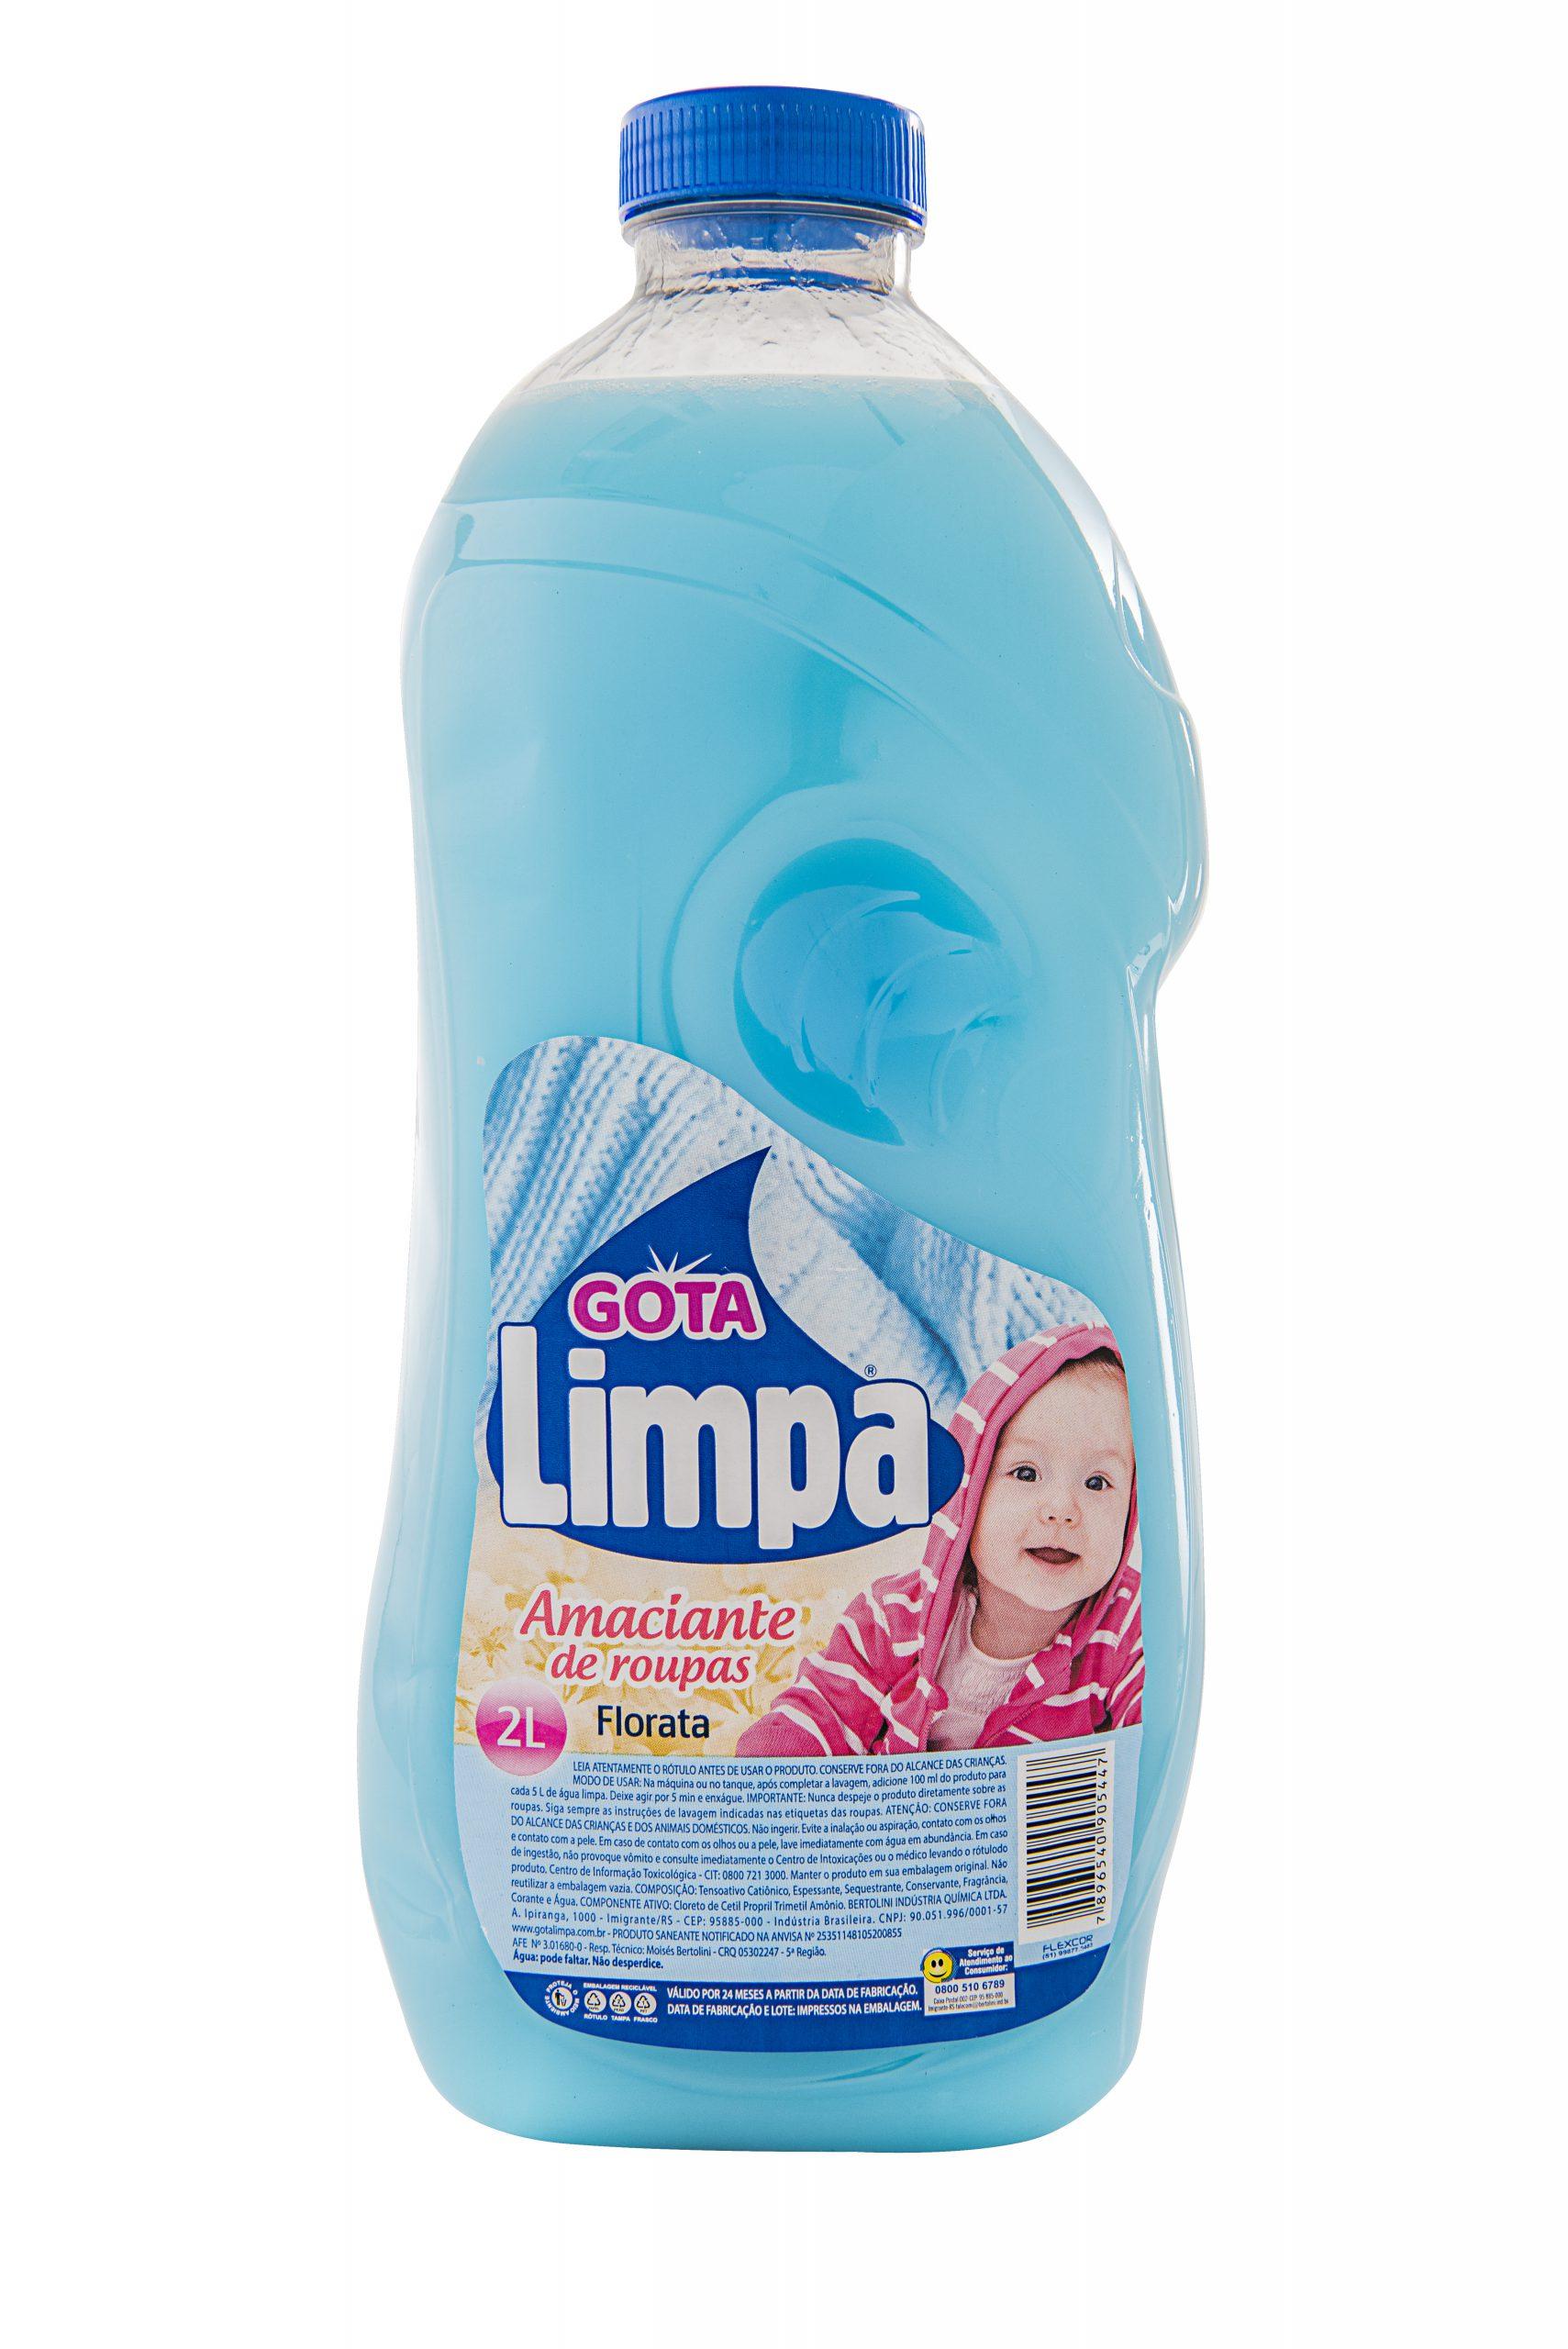 Amaciante Gota Limpa Florata 2L